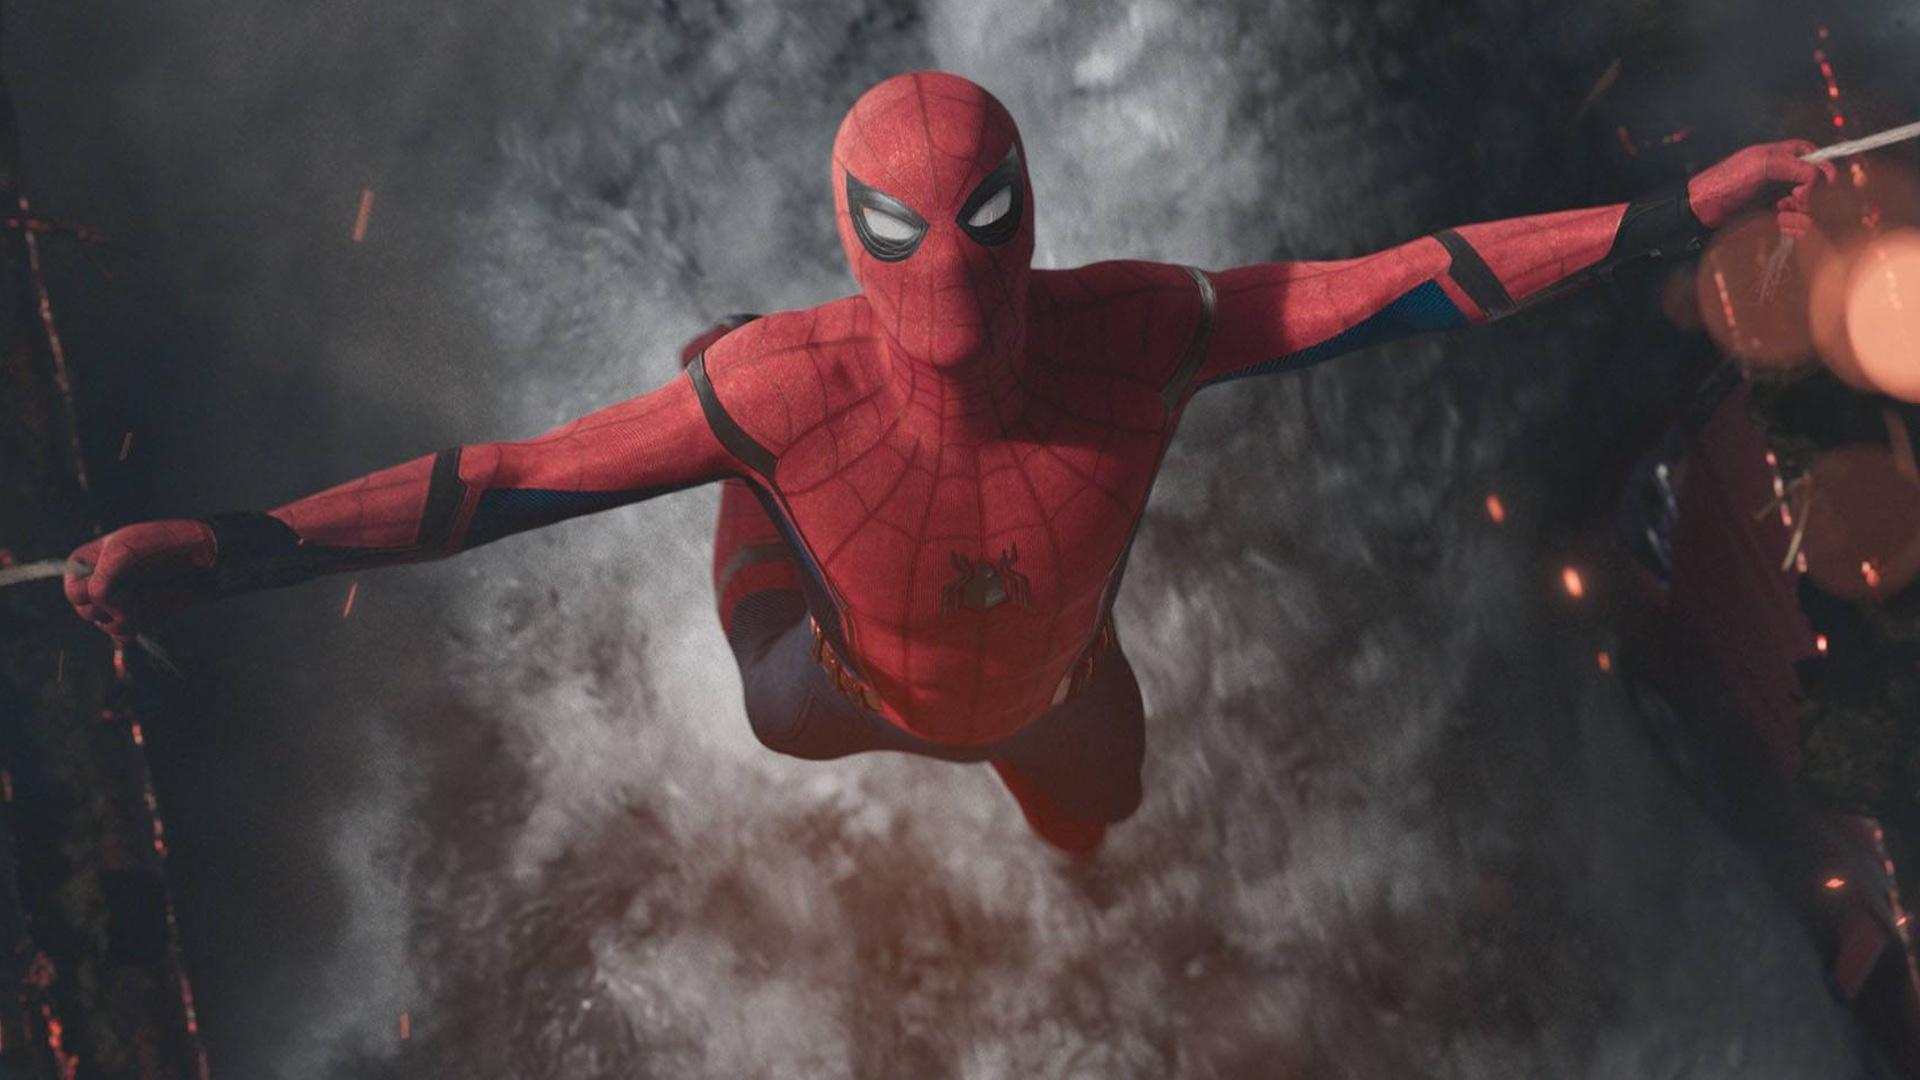 marvel-director-jon-watts-confirms-howard-the-duck-easter-egg-in-spider-man-homecoming-social.jpg